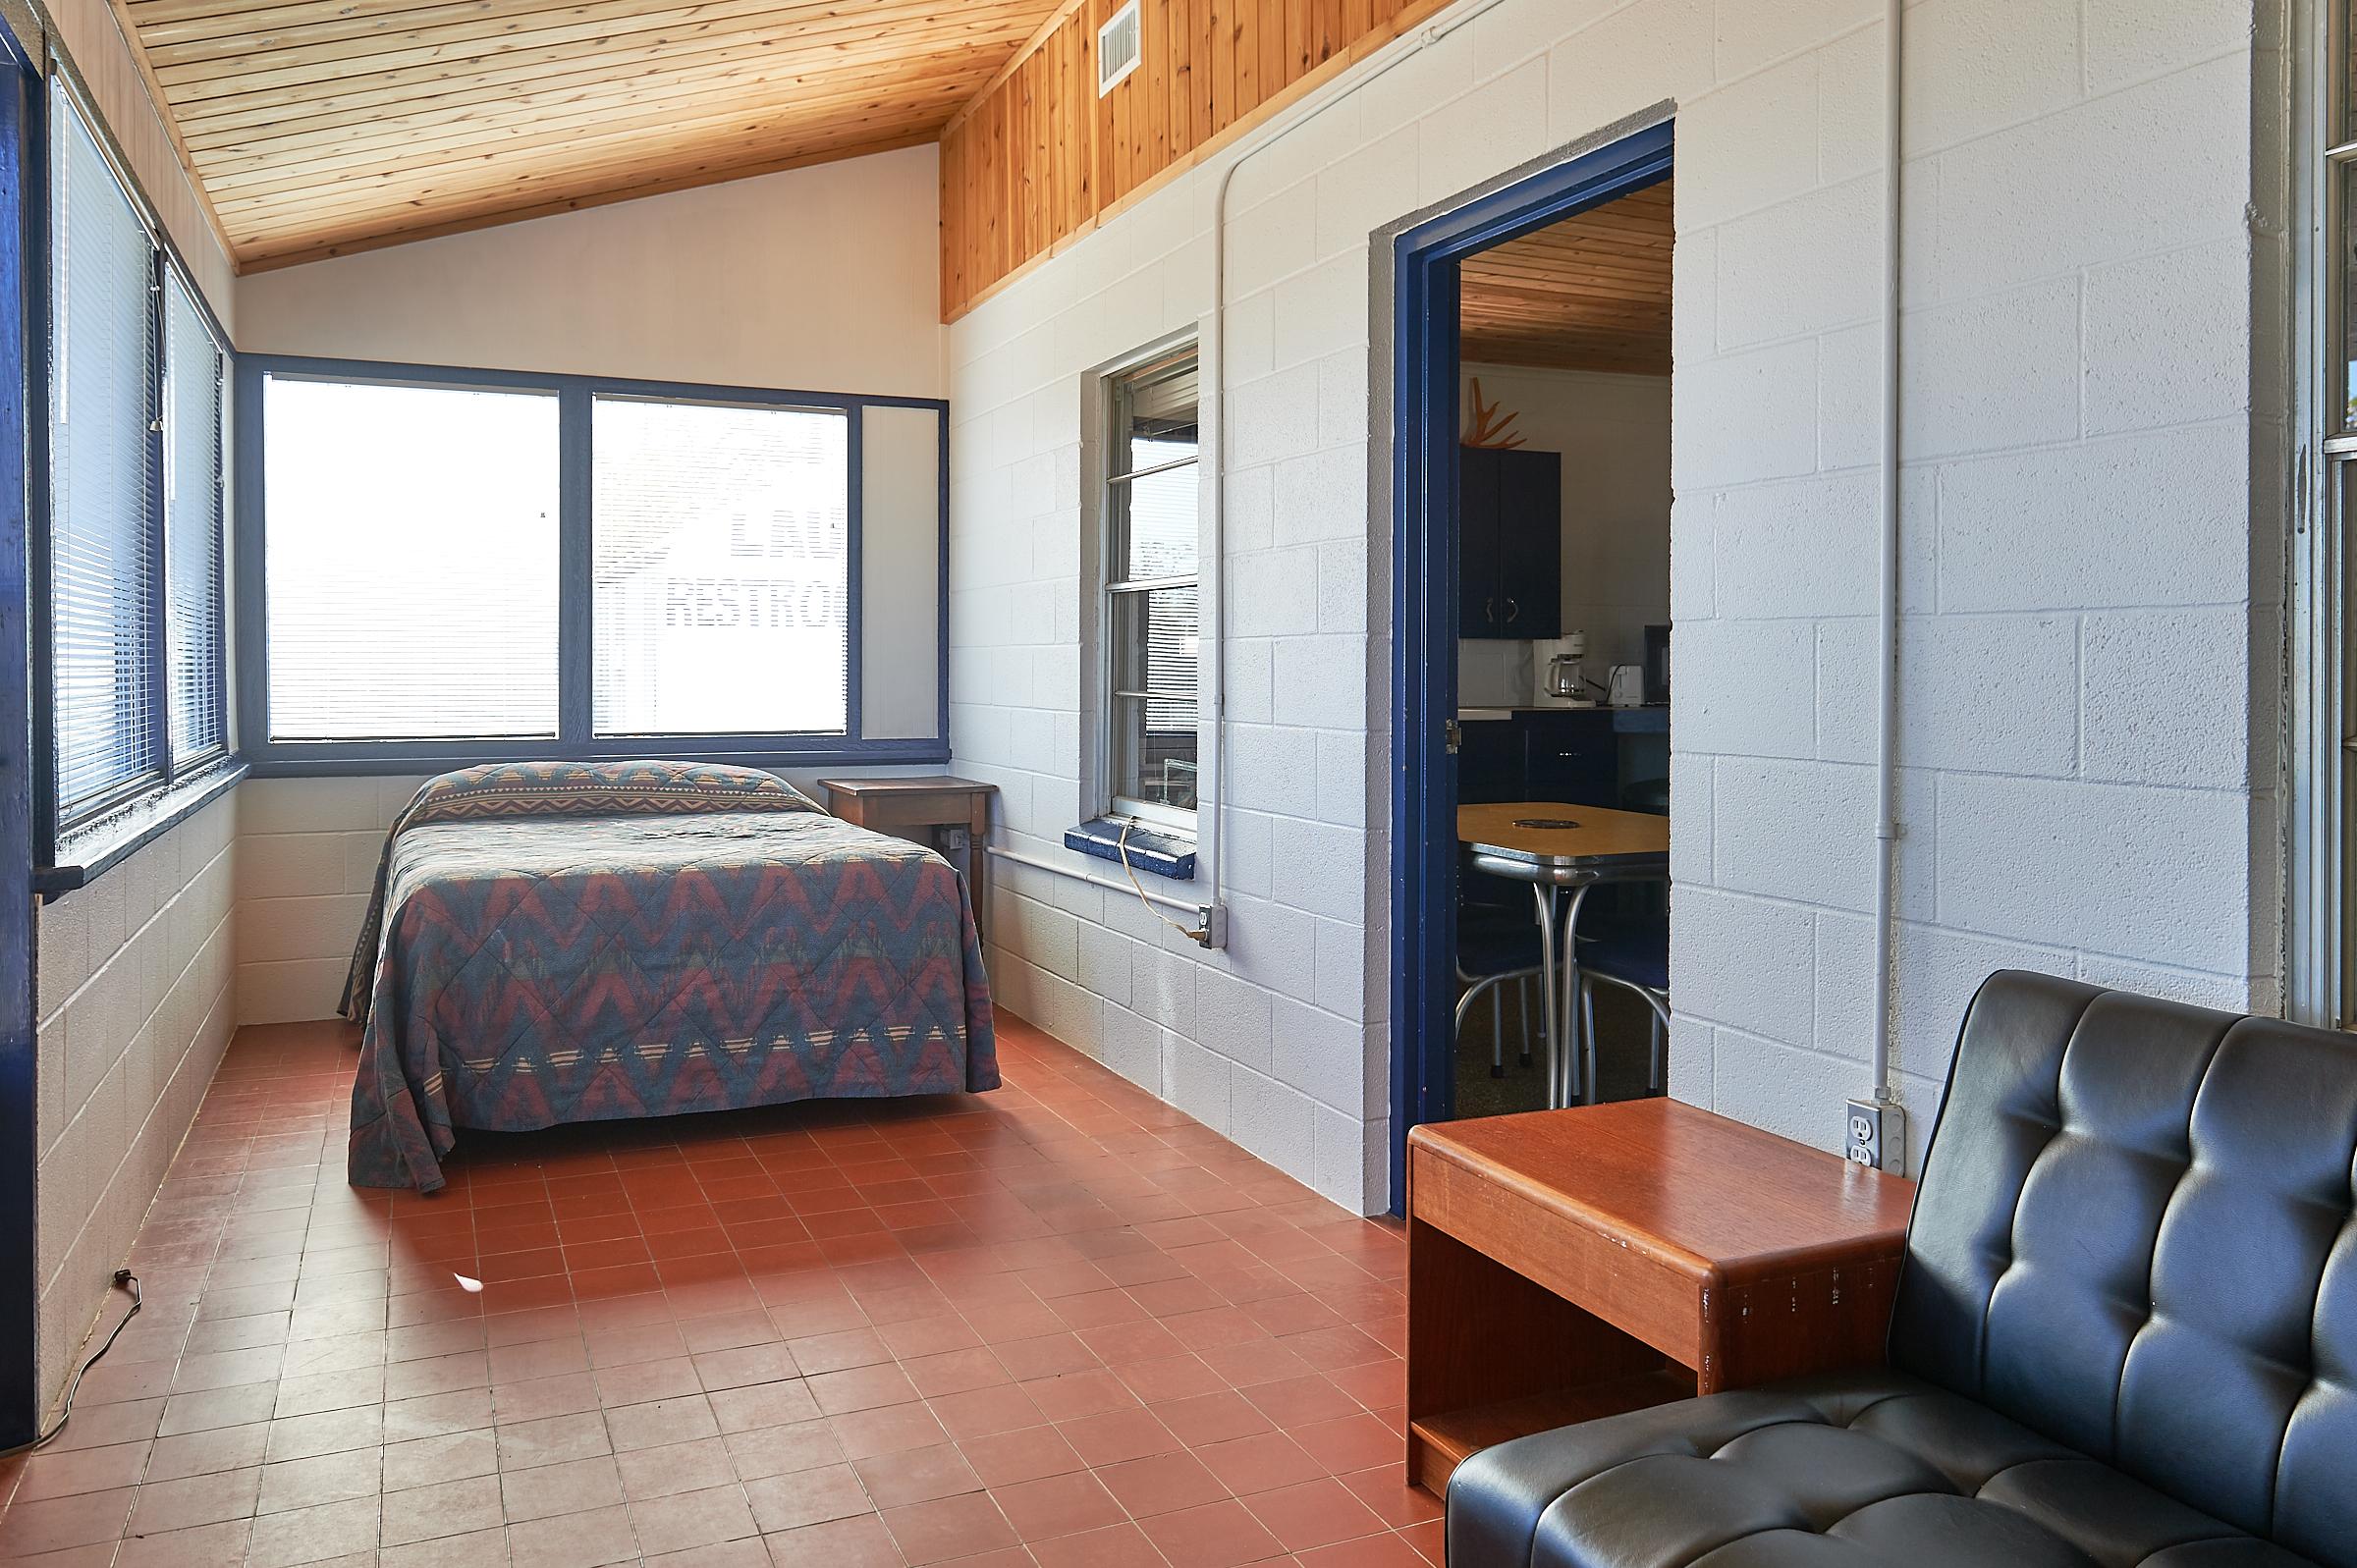 Whitetail Deer Cabin Extra Bedroom